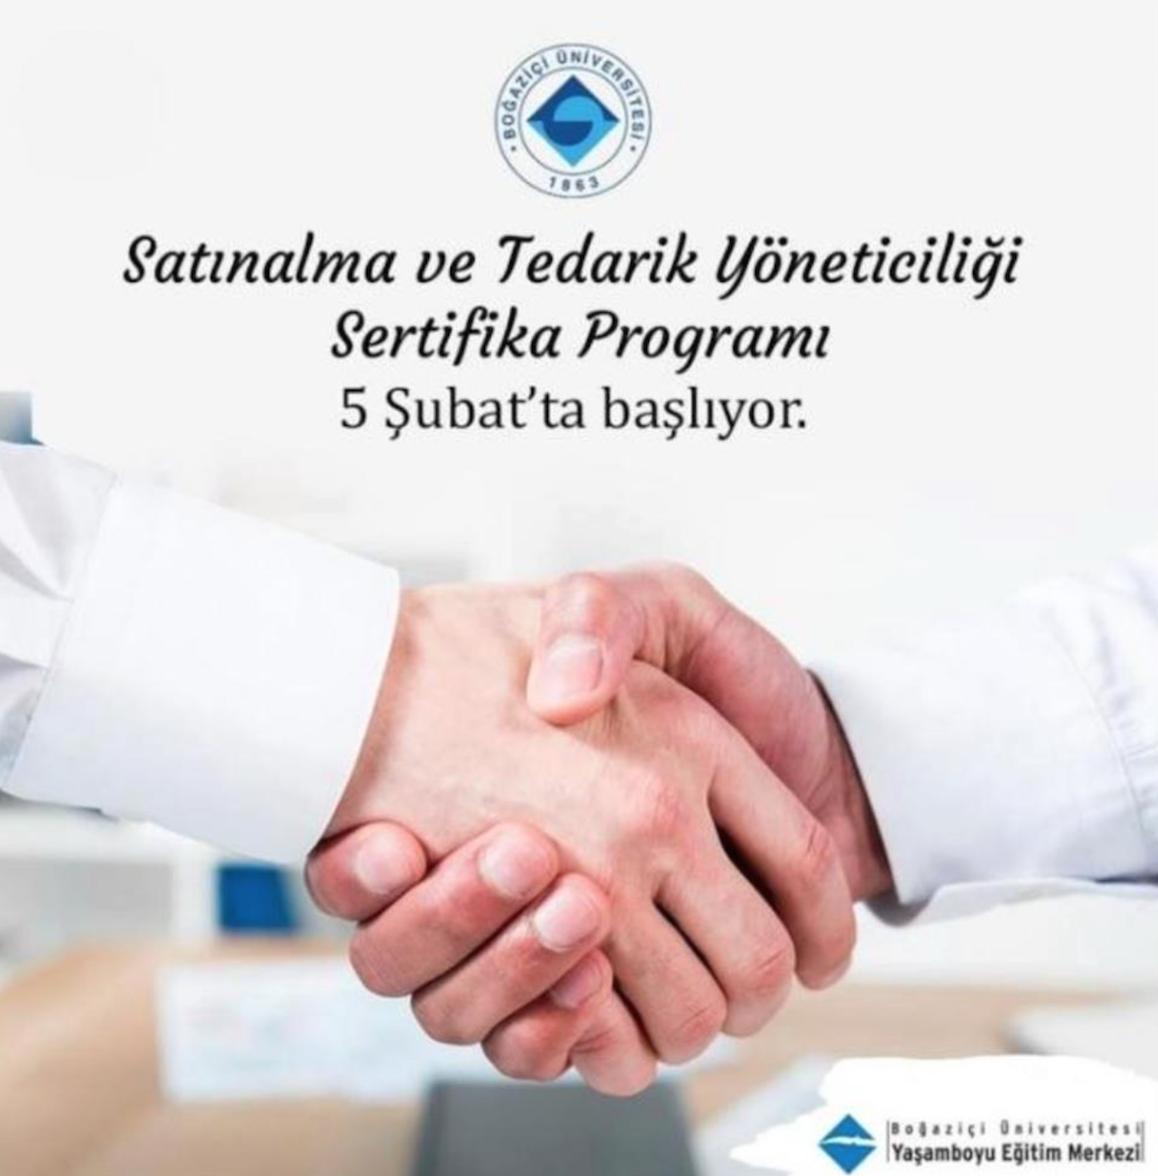 TÜSMOD Serkan UYGUR Consulting www.serkanuygur.com.tr